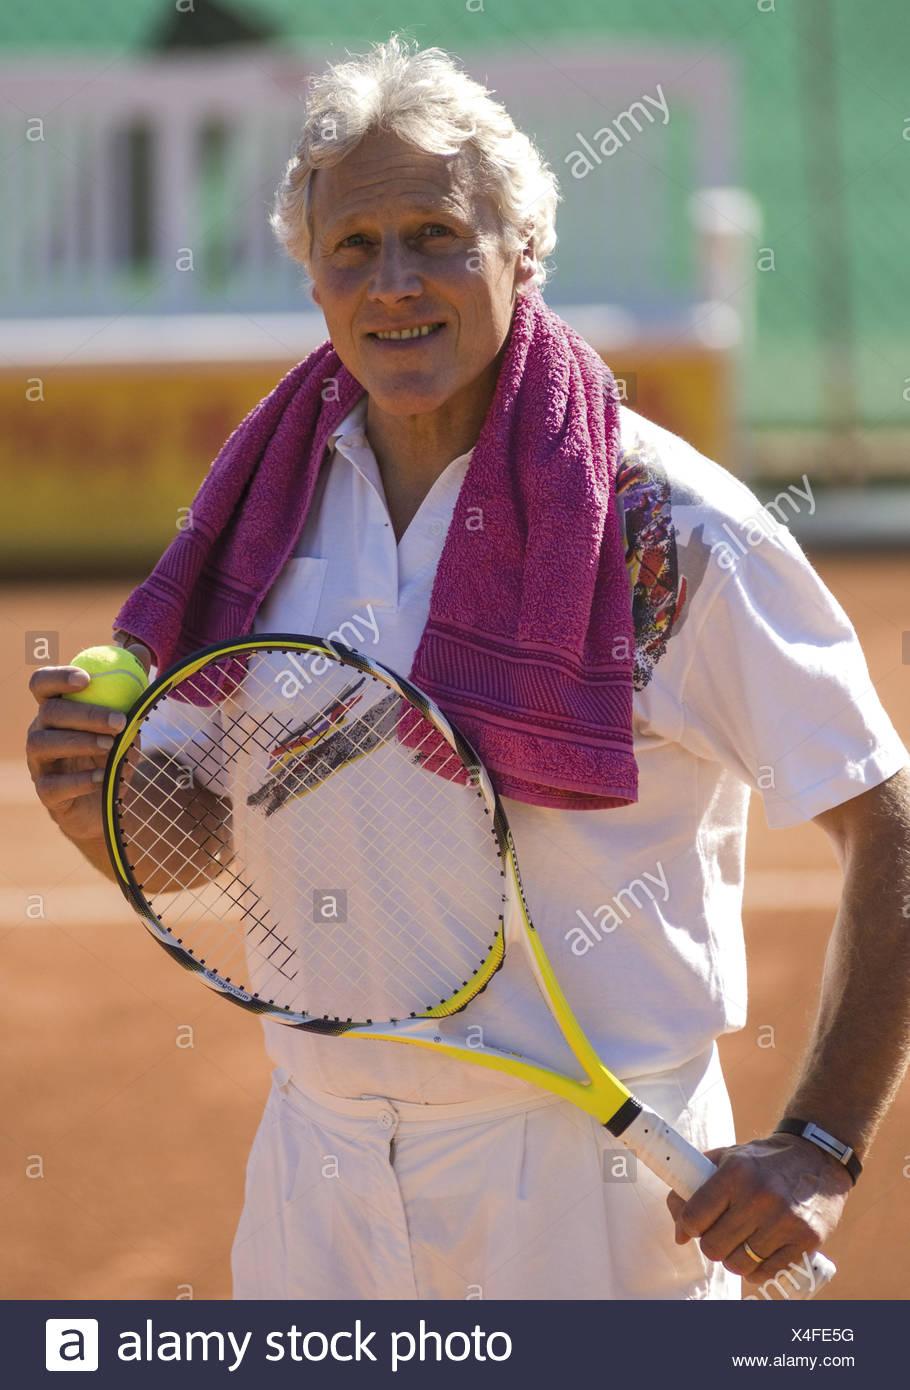 Aelterer Mann als Tennisspieler (model-released) Stock Photo